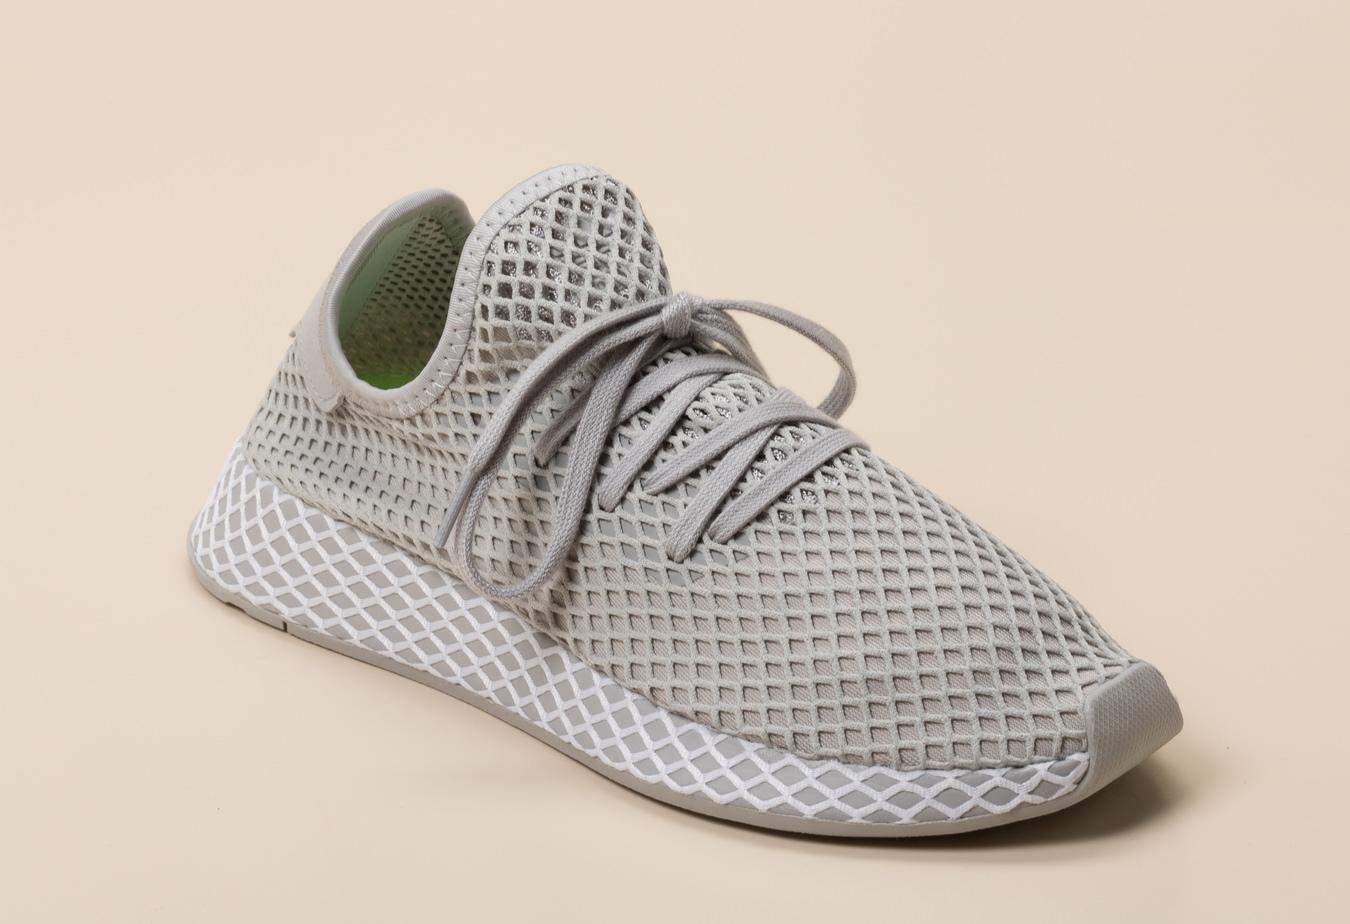 Adidas Herren Sneaker in grau kaufen   Zumnorde Online Shop